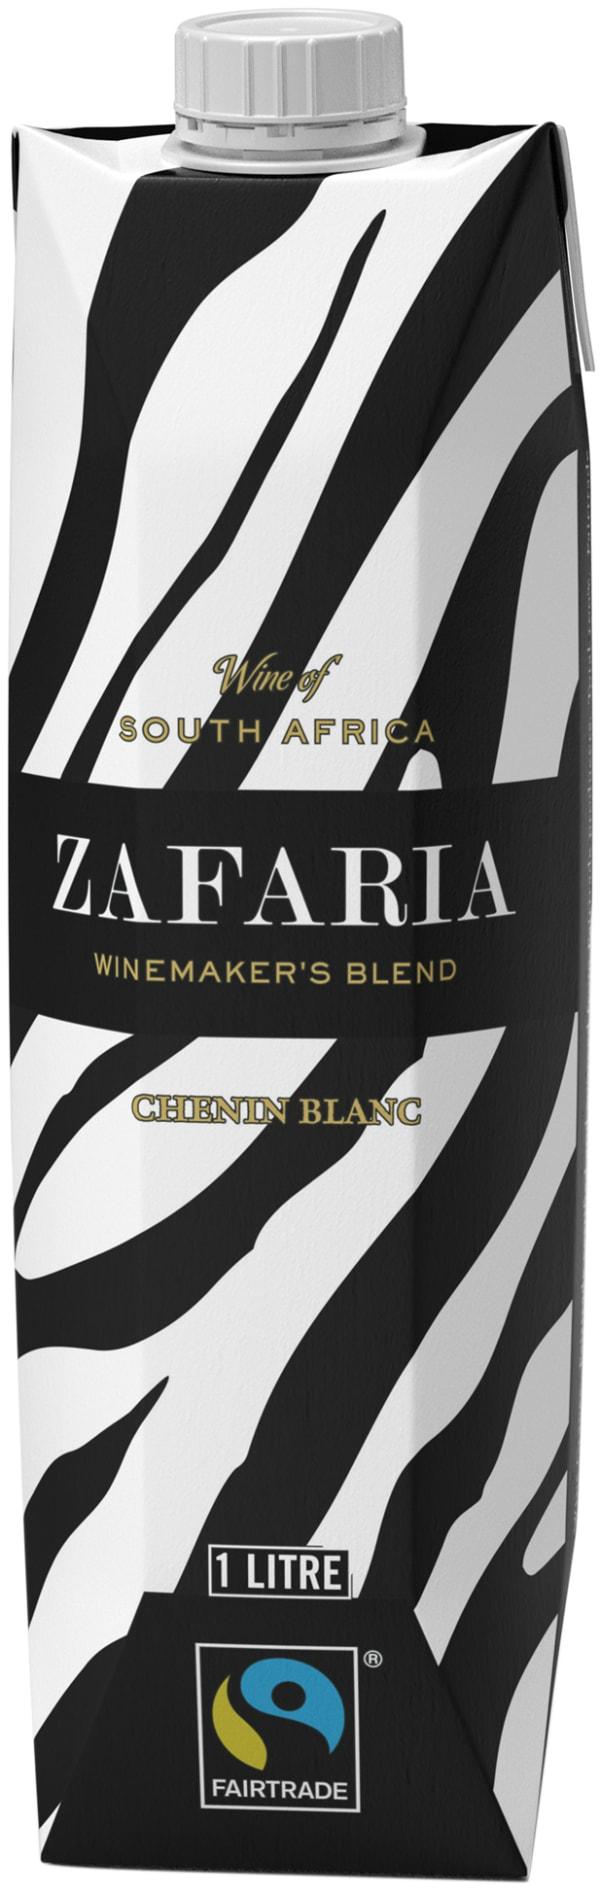 Zafrica Winemakers Blend Chenin Blanc 2017 kartongförpackning